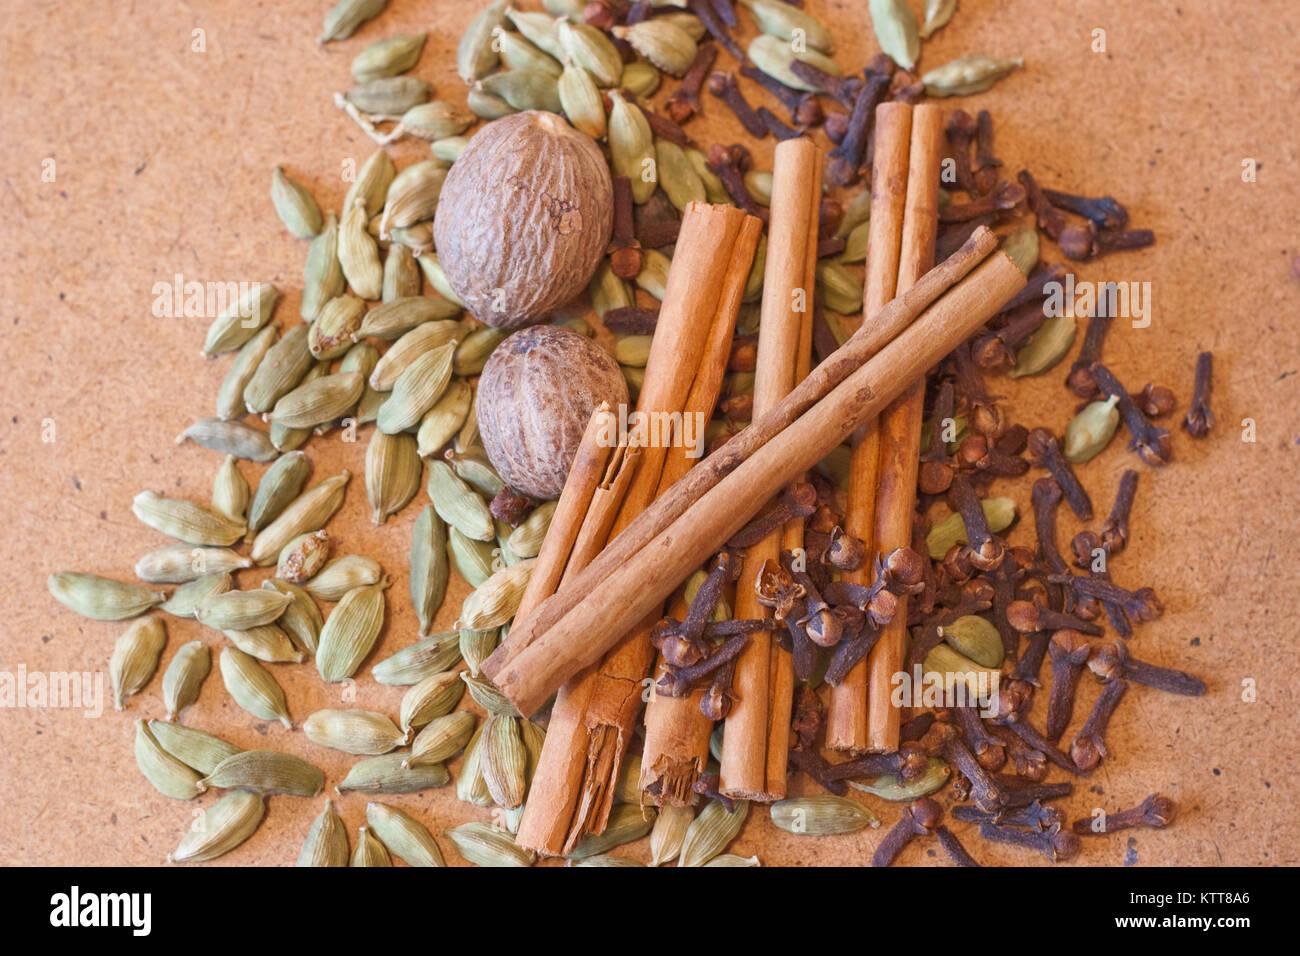 Cardamom pods, cinnamon sticks, whole nutmeg and cloves on plain background - Stock Image